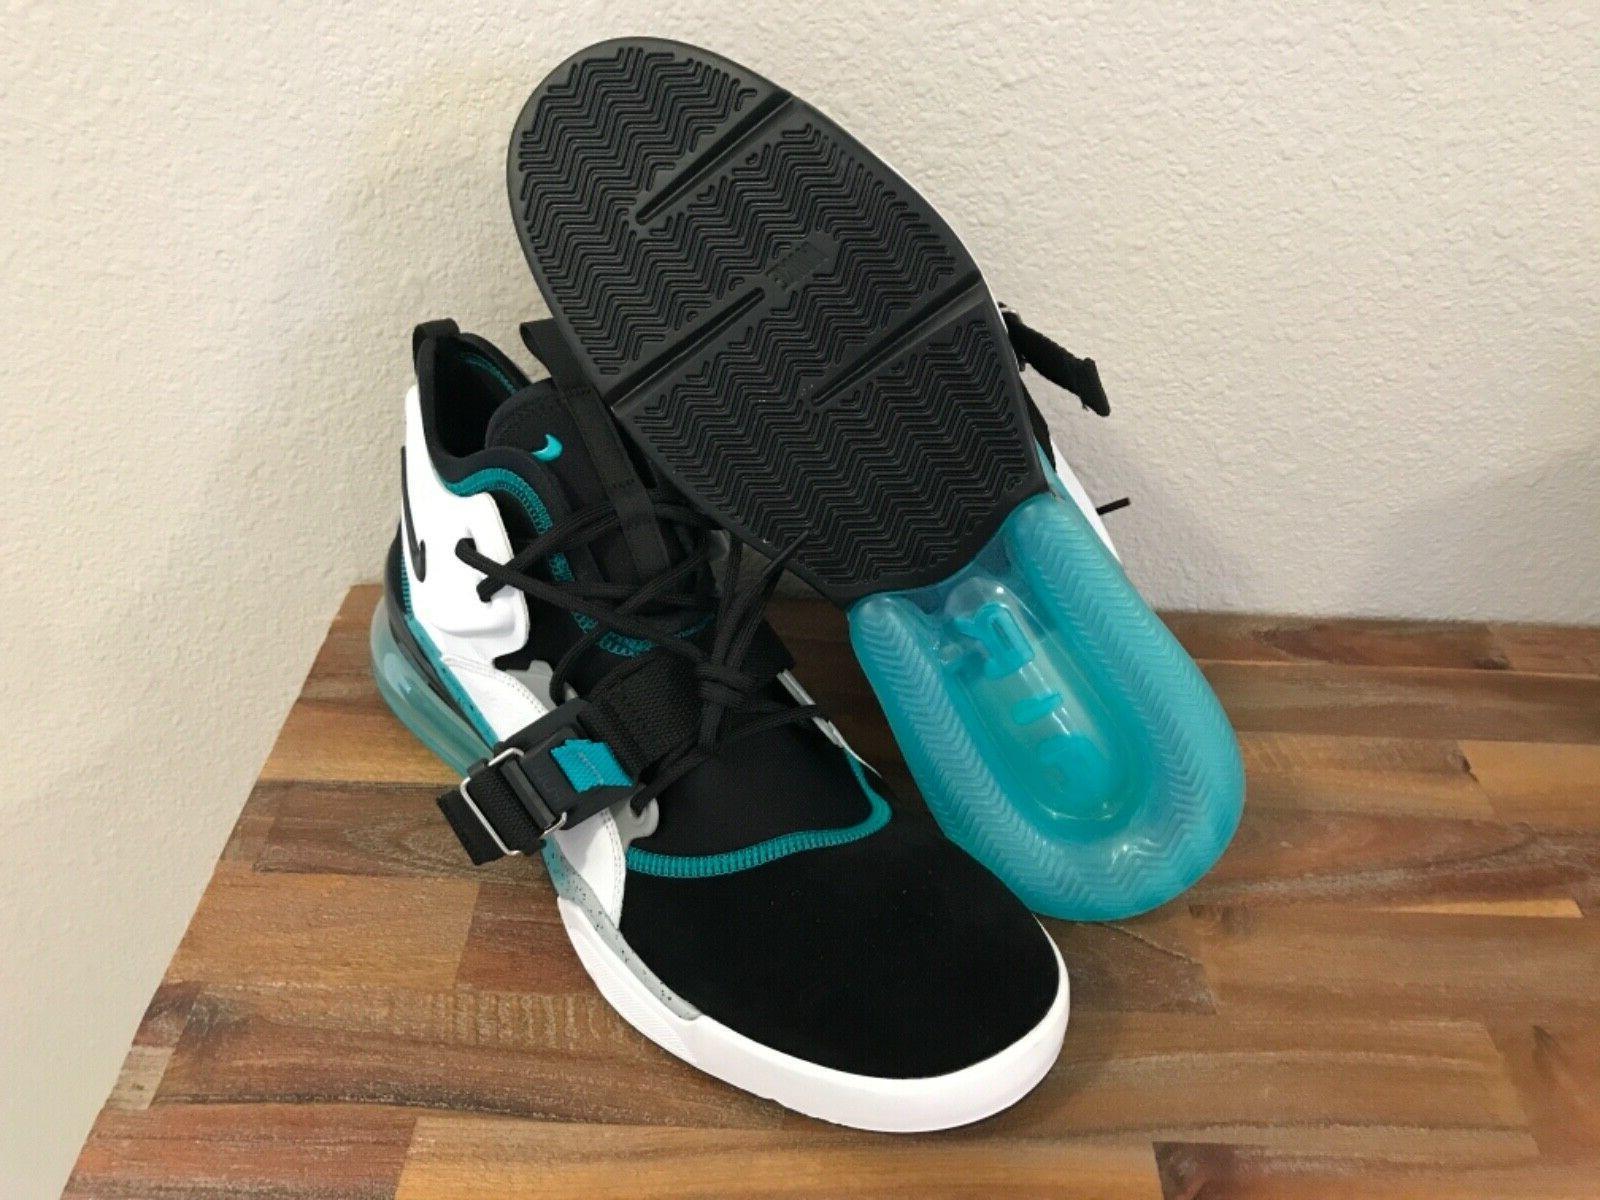 New Nike 270 Emerald Size